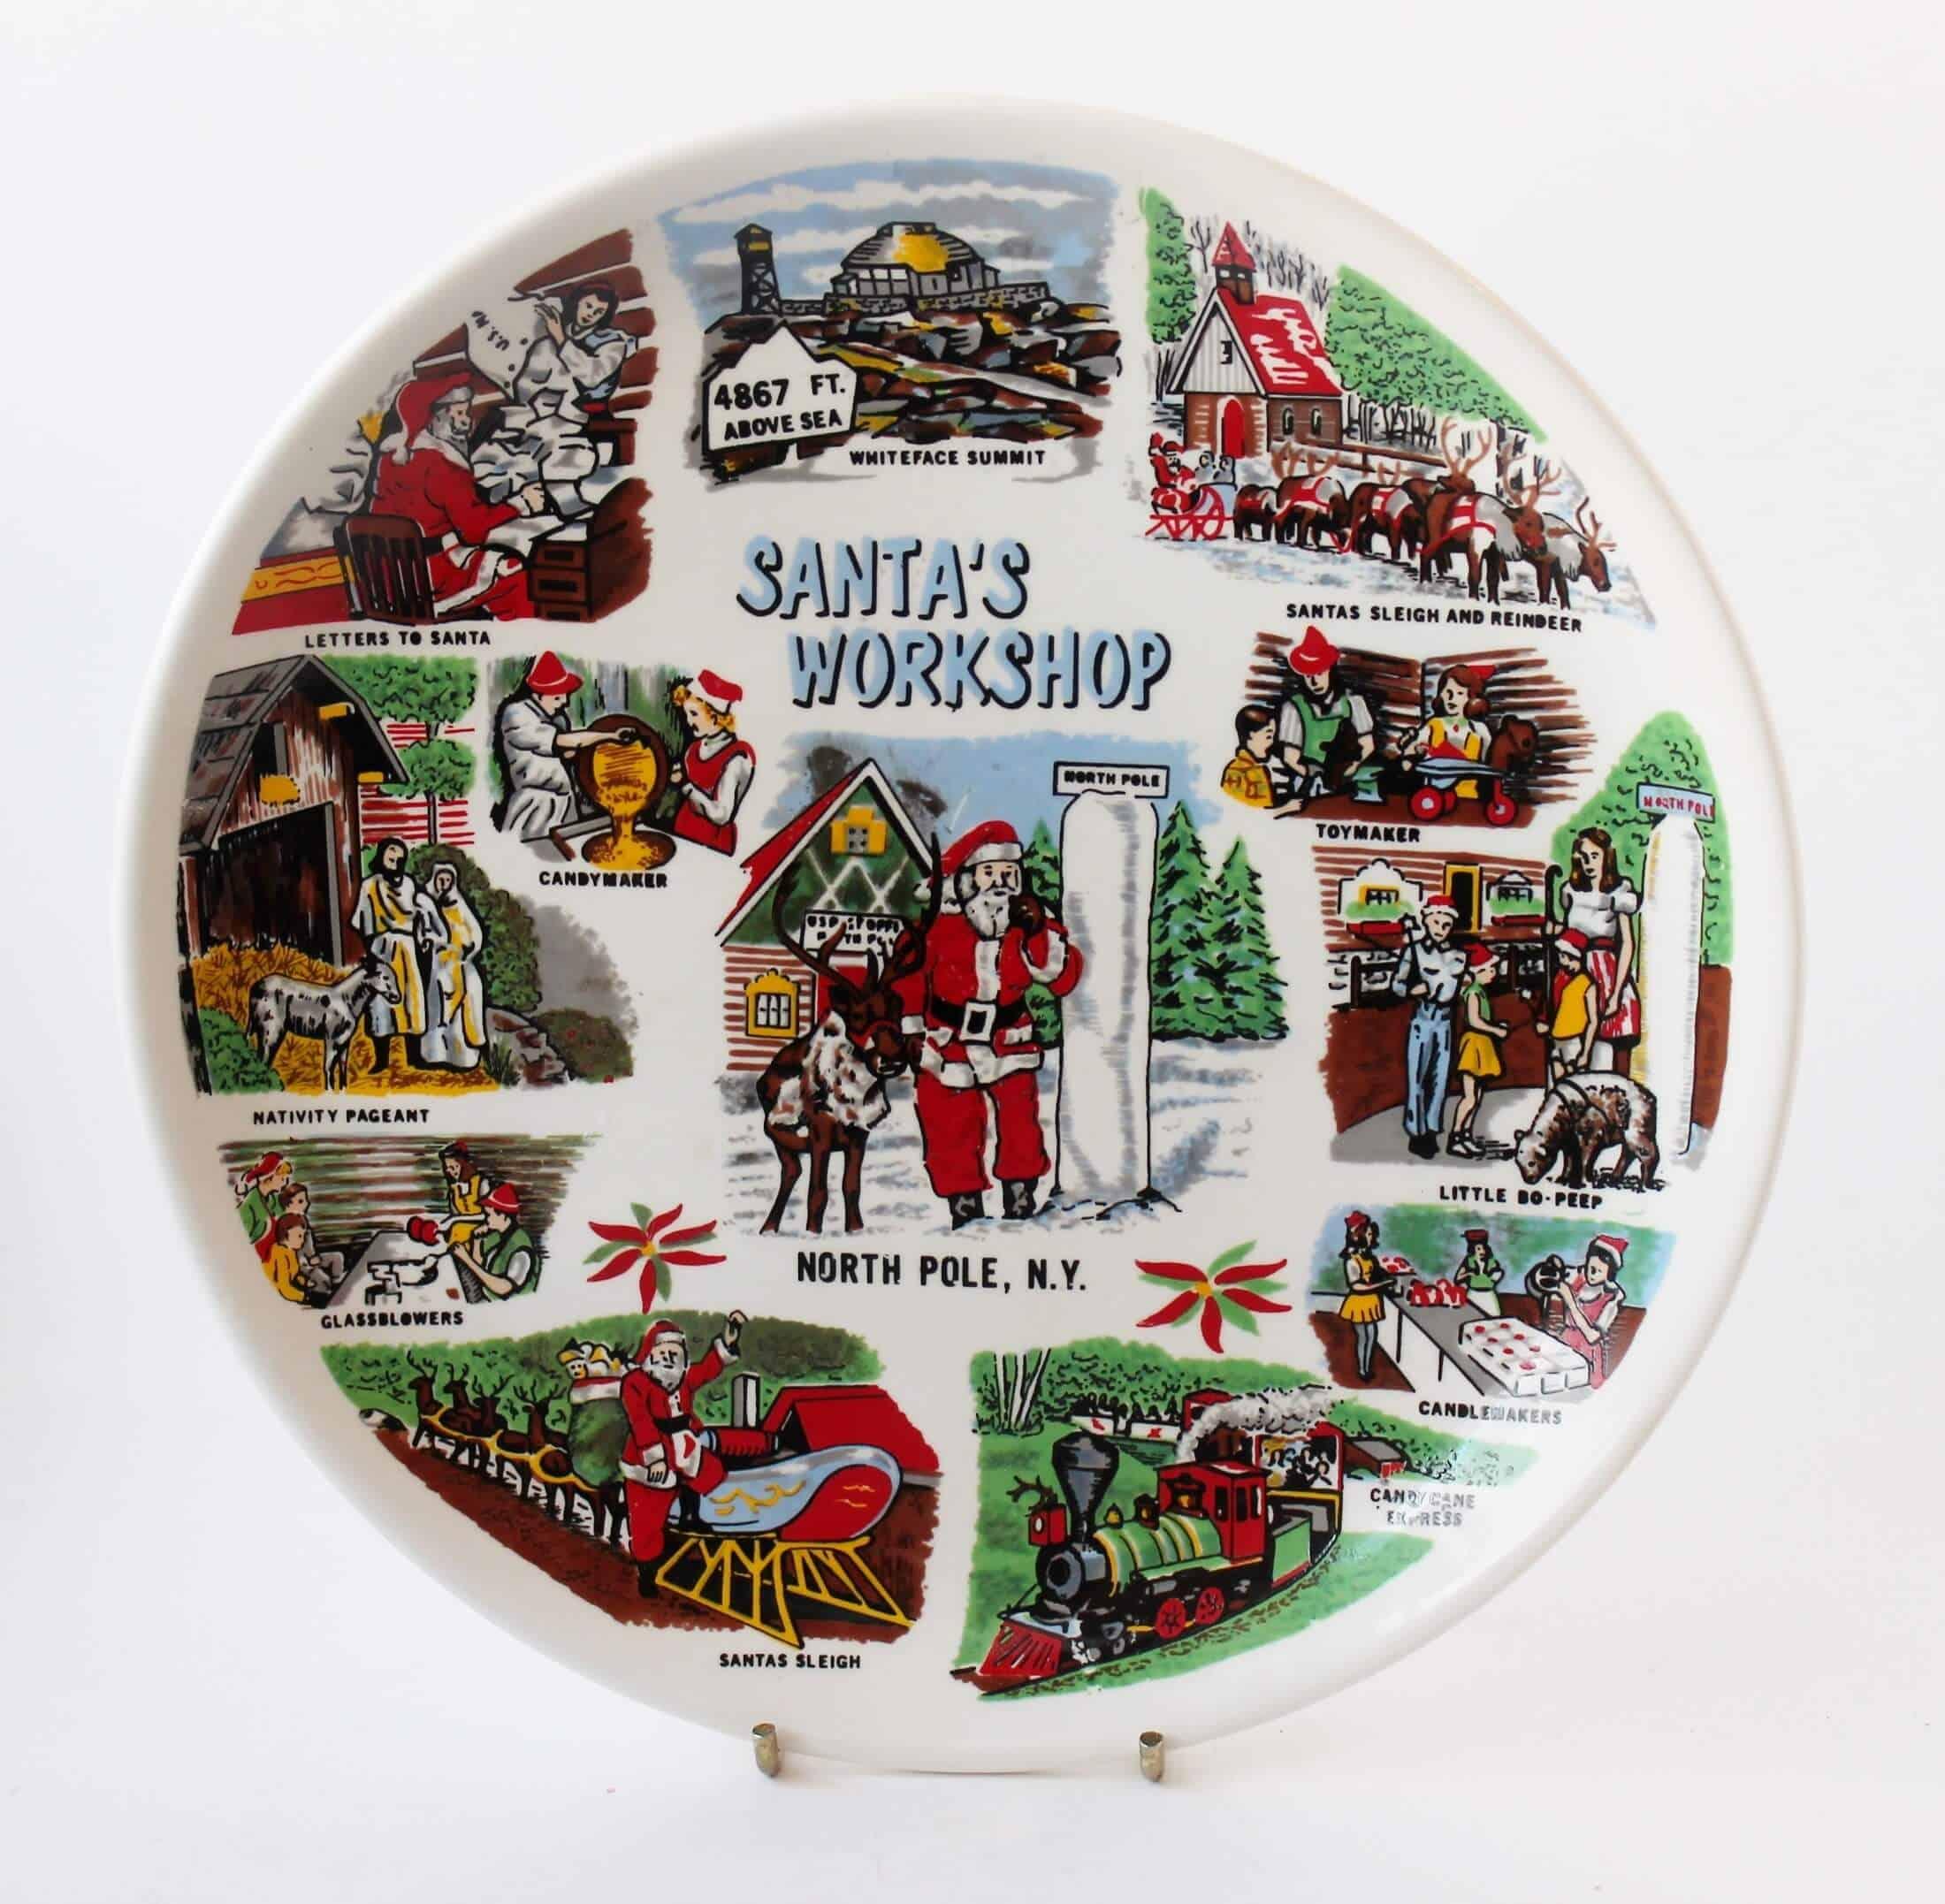 Vintage Find: Santa's Workshop Souvenir plate